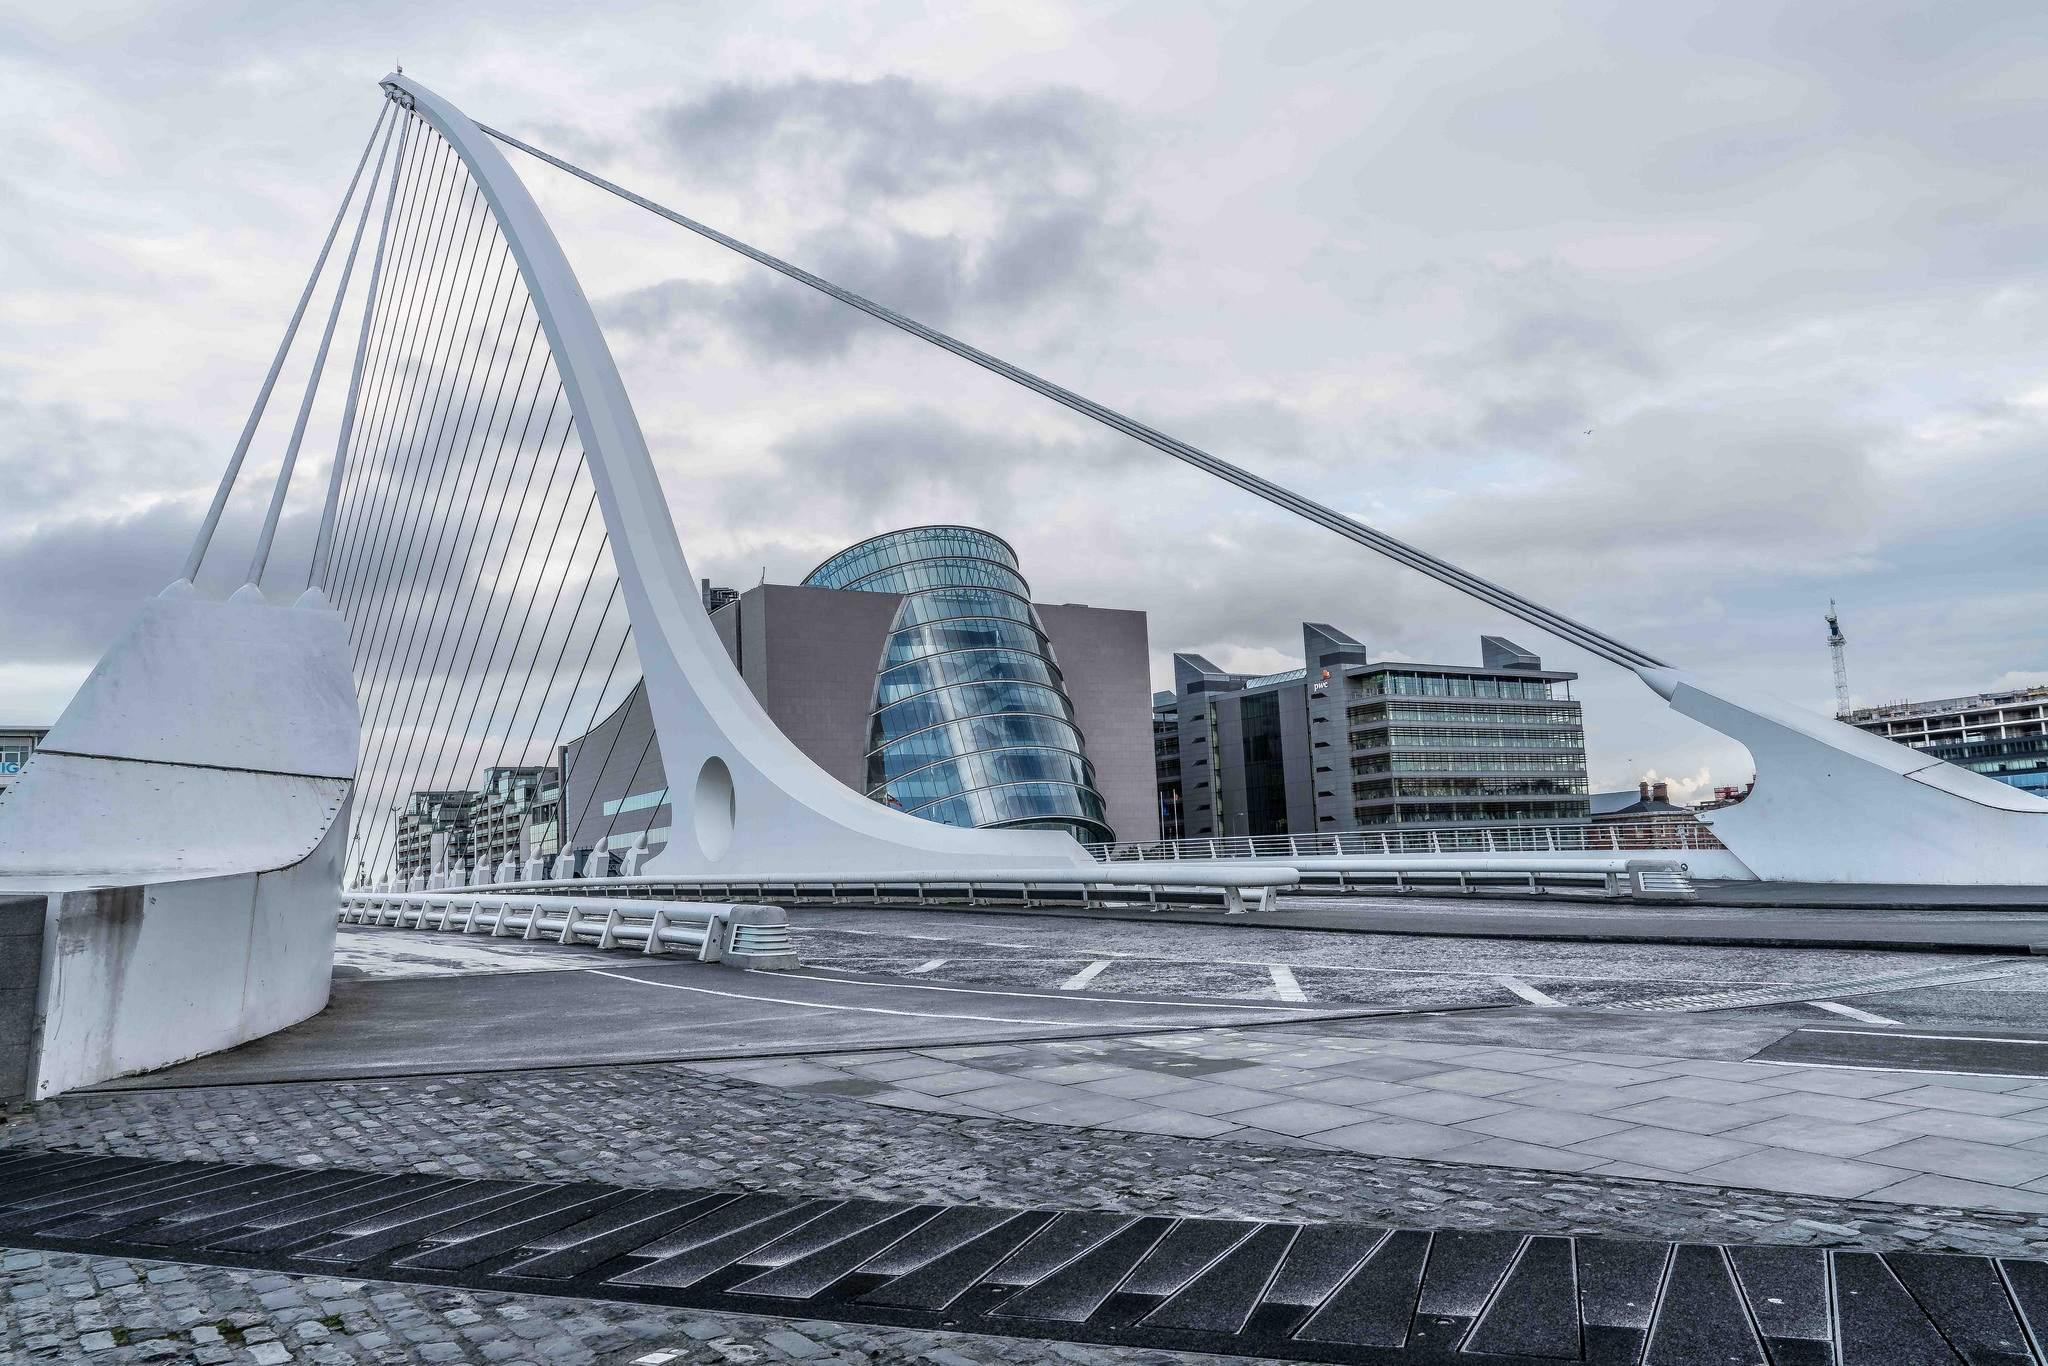 dublin docklands Walking Around Dublin Docklands by Marphy